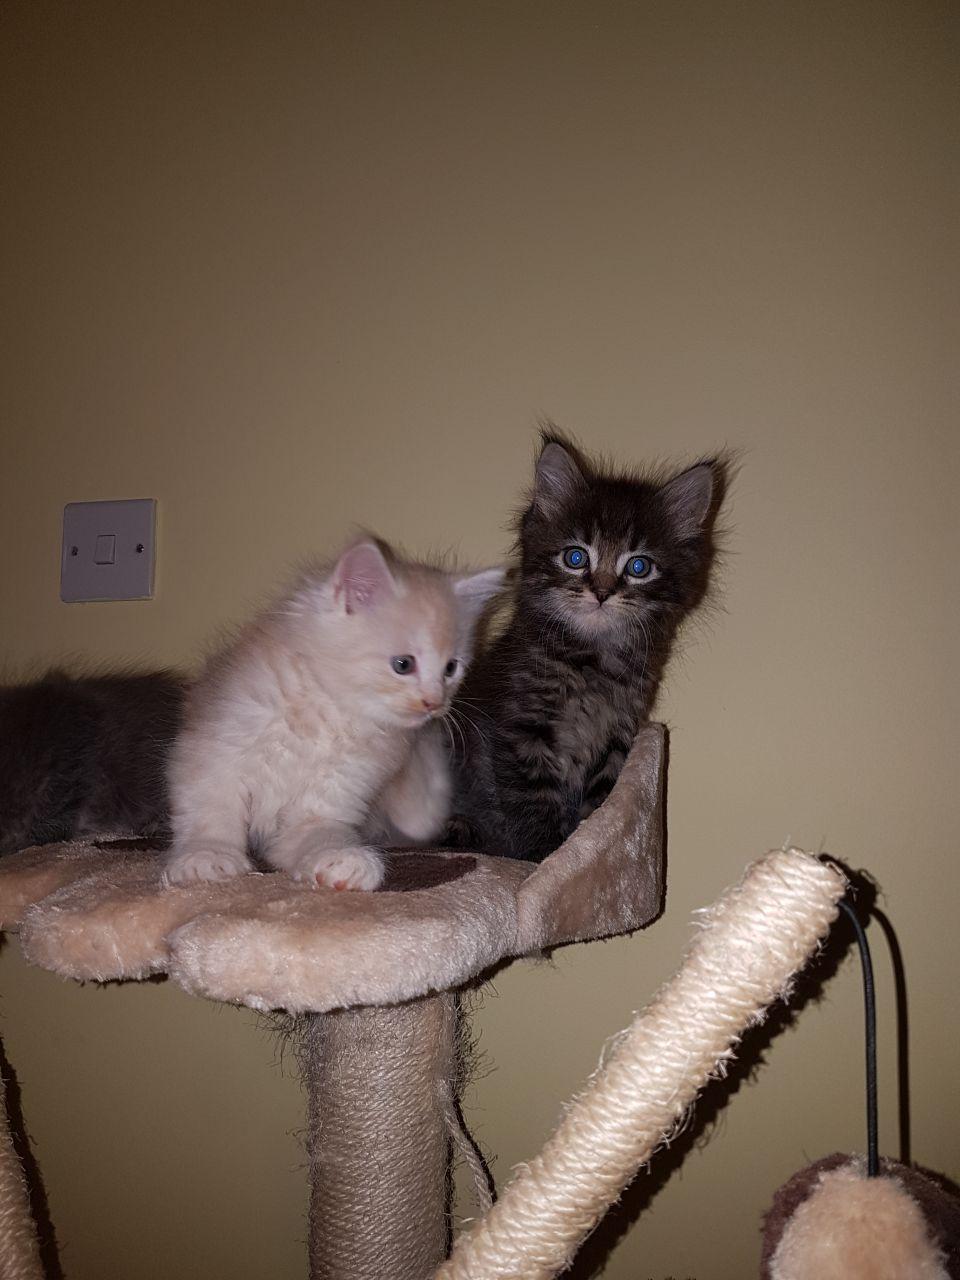 Maine Coon Kittens Jacksonville Fl : maine, kittens, jacksonville, Maine, Jacksonville,, #256077